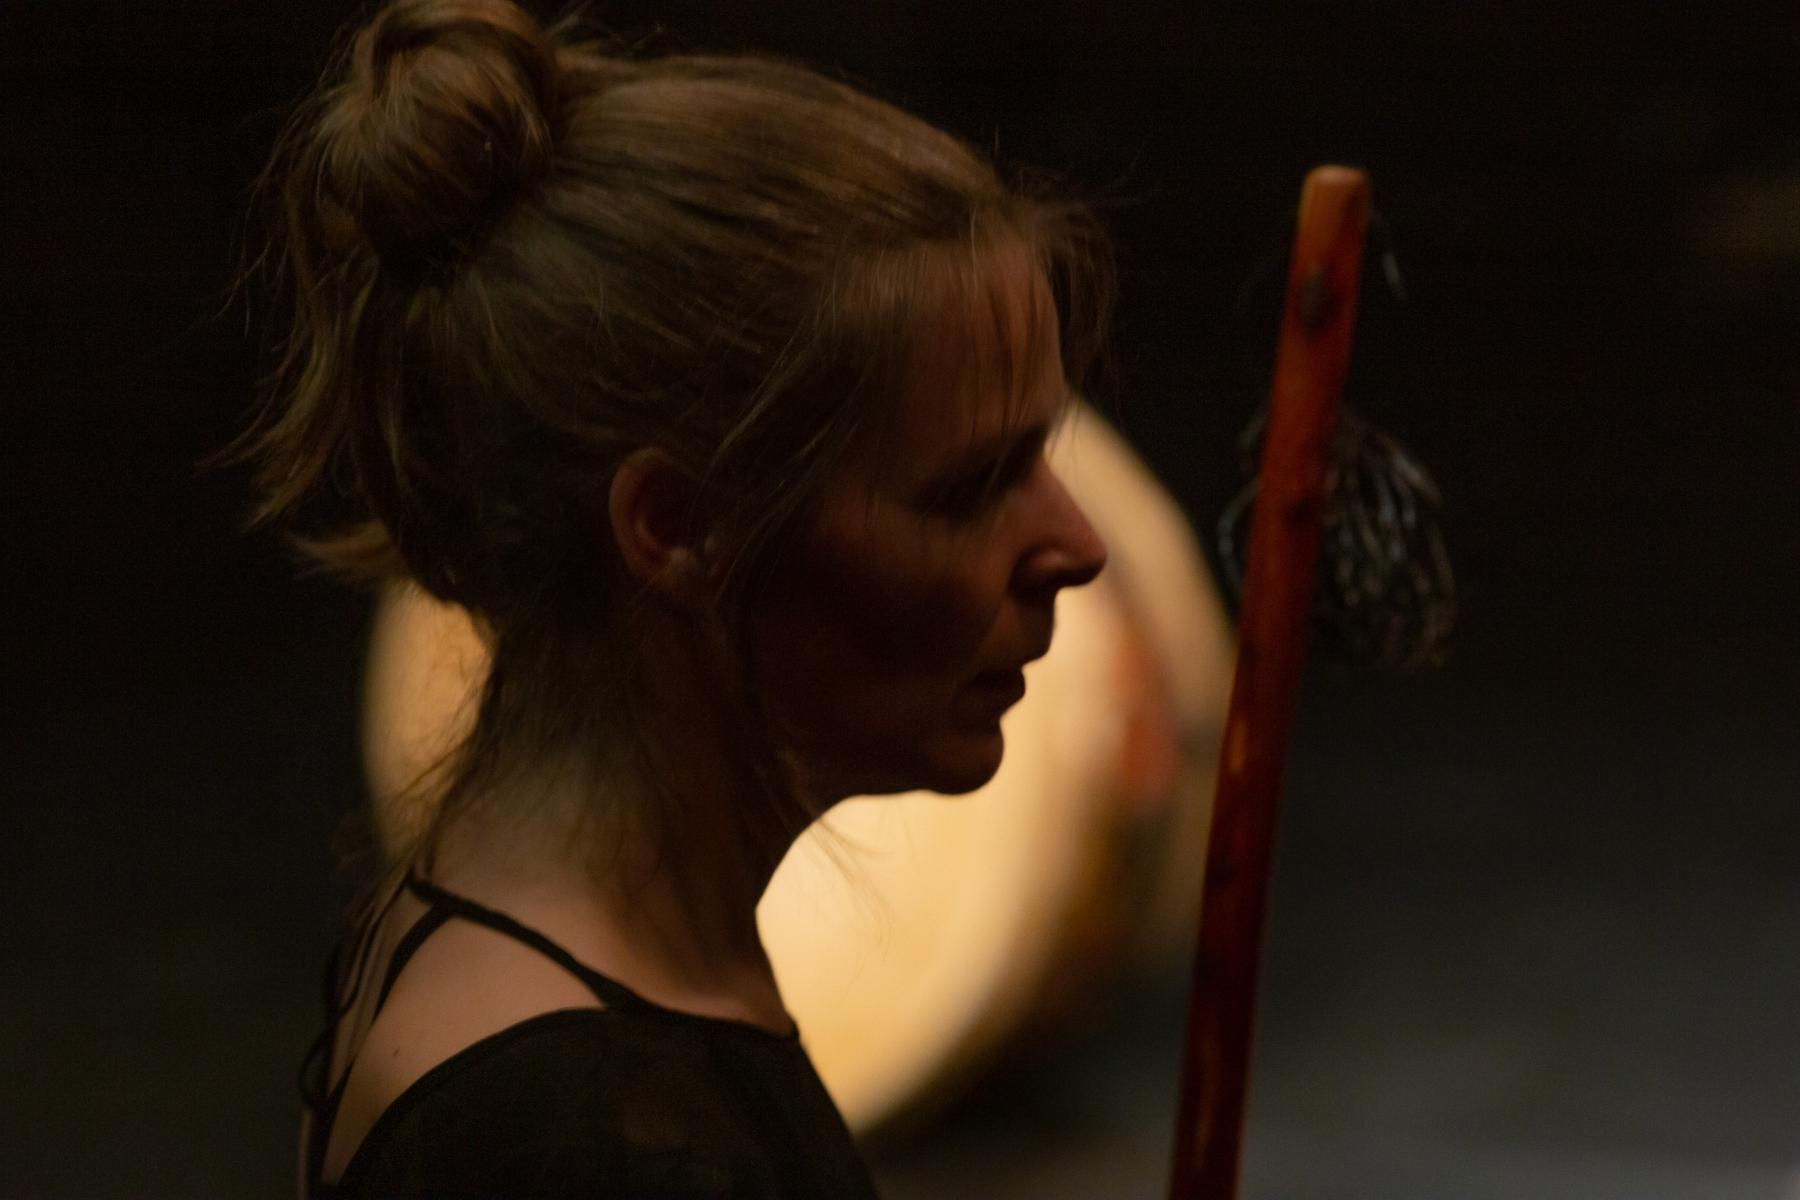 Kersti-profil-close-up